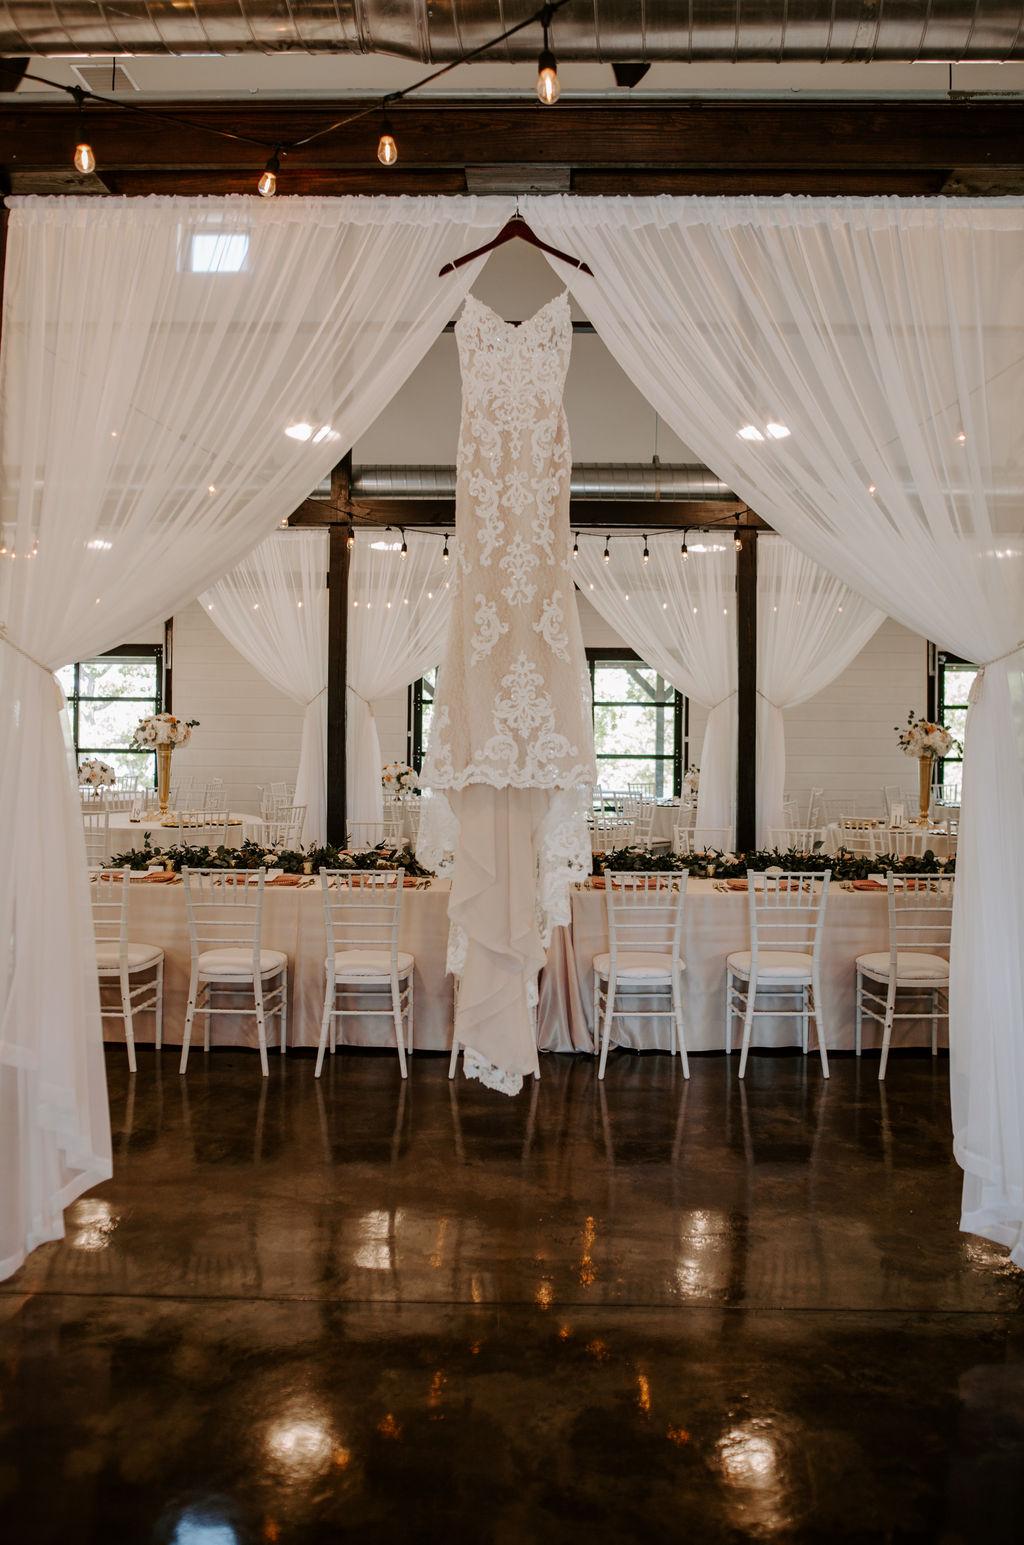 Best Oklahoma Outdoor Wedding Venue Tulsa Bixby White Barn 0.jpg